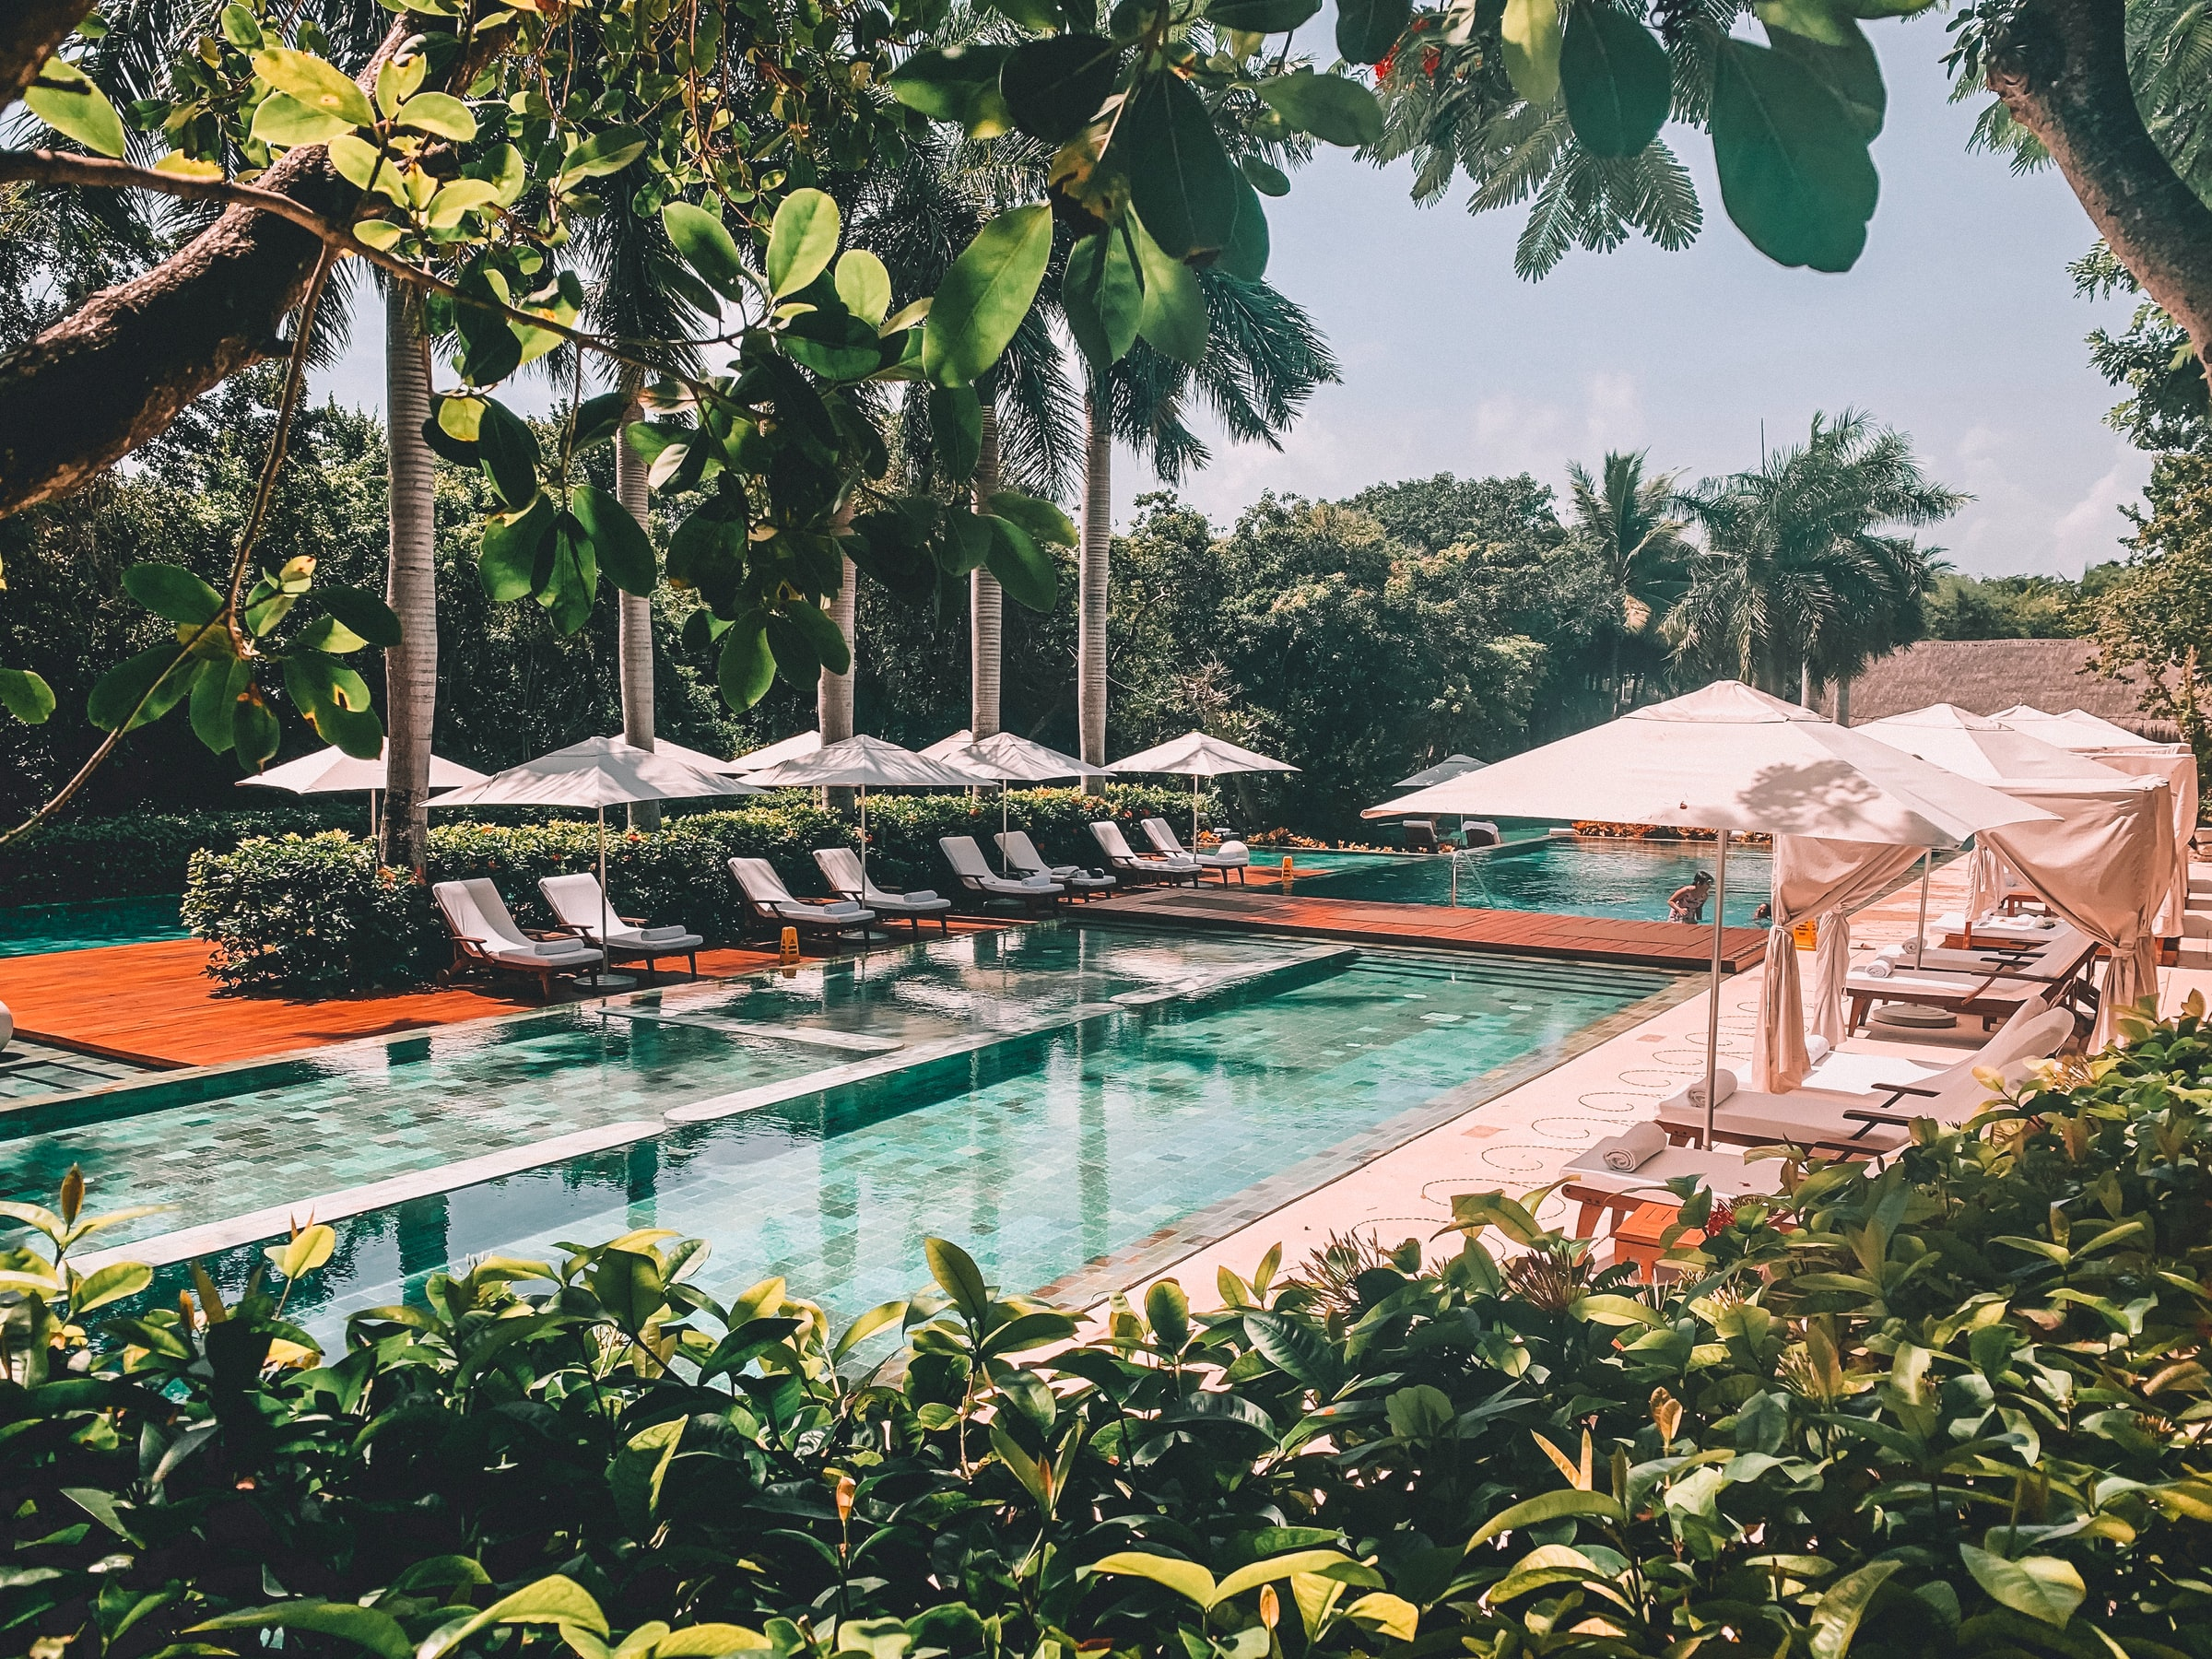 Pool tourism